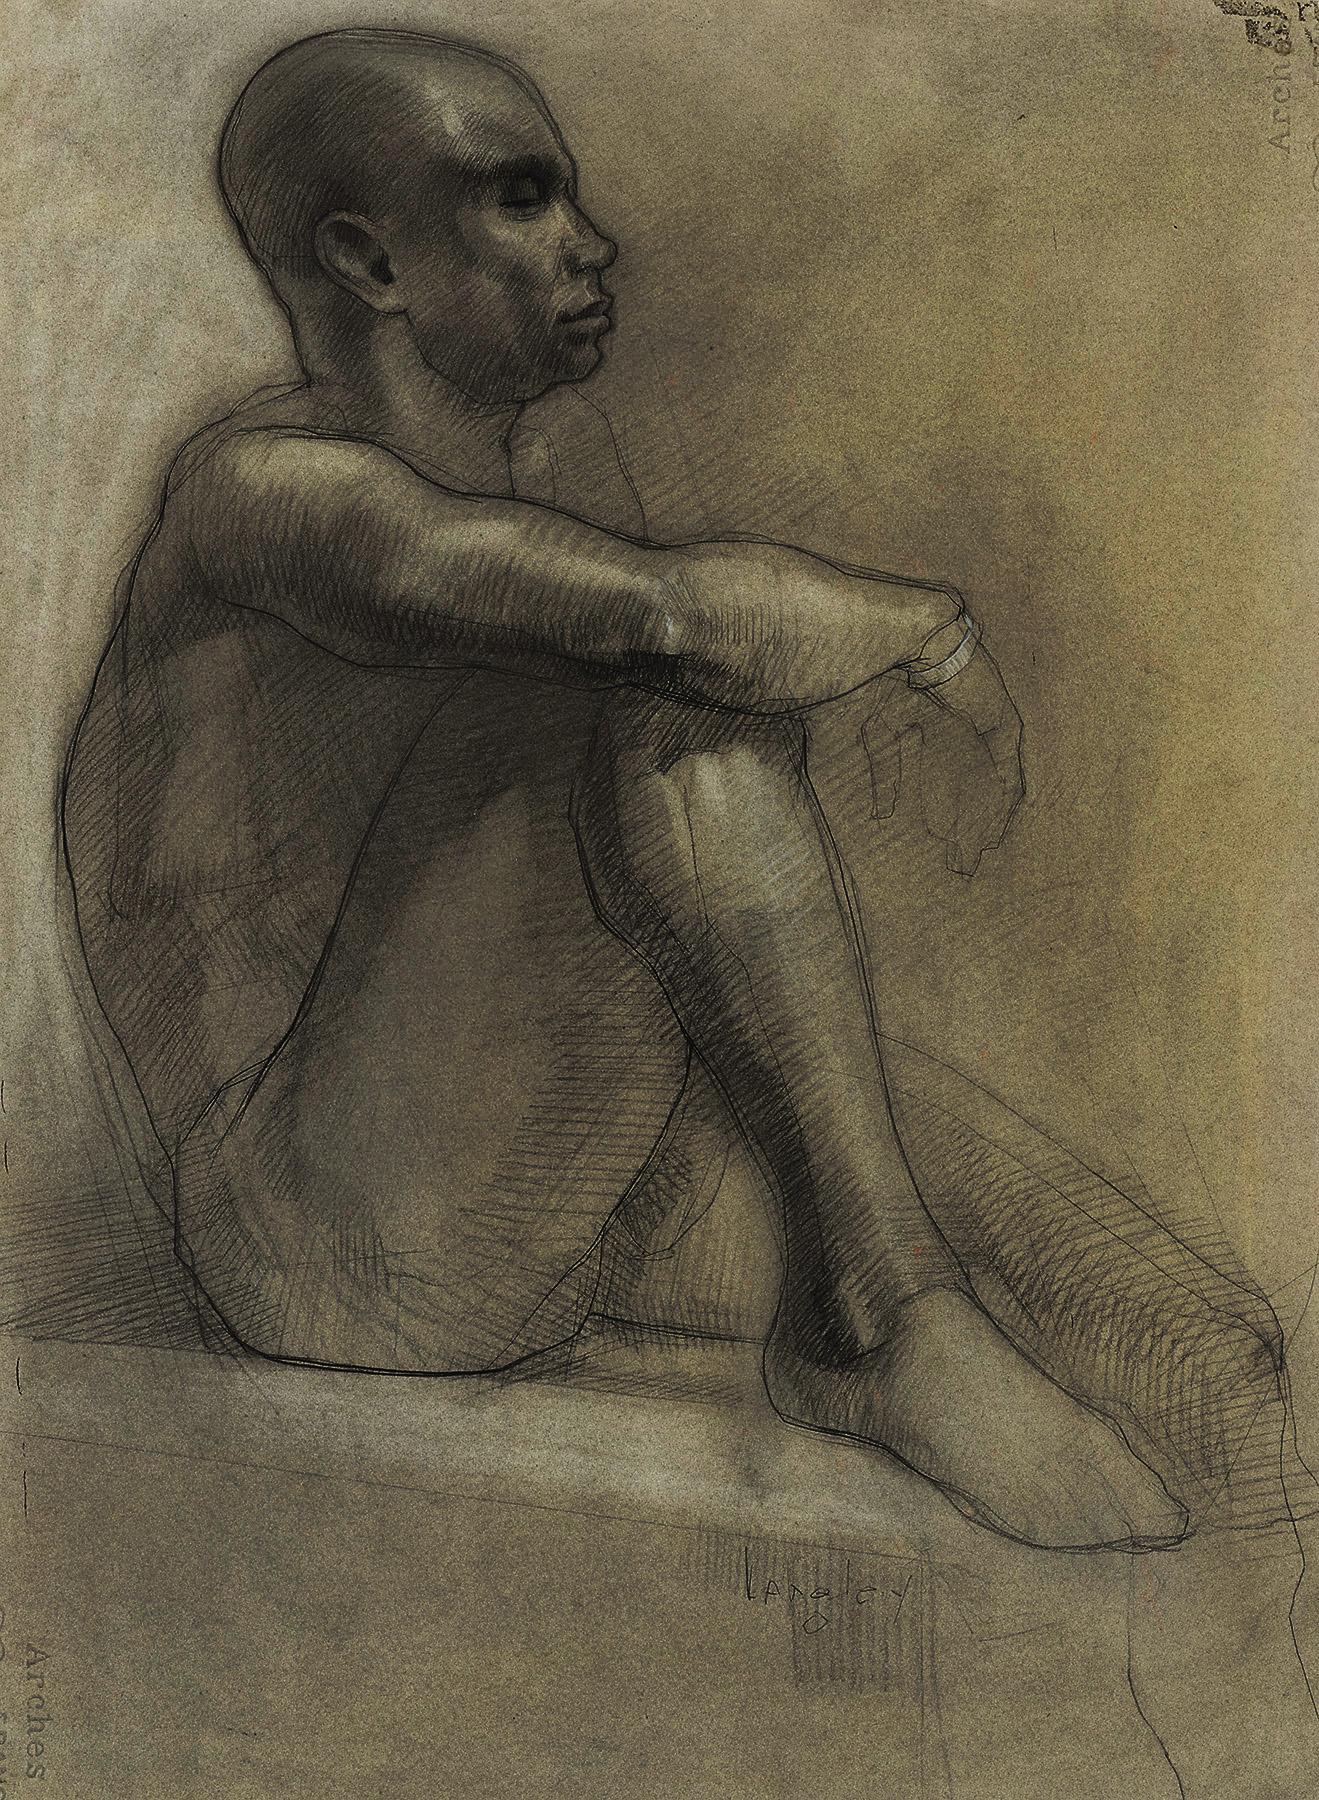 langley bald male nude seated profile.jpg